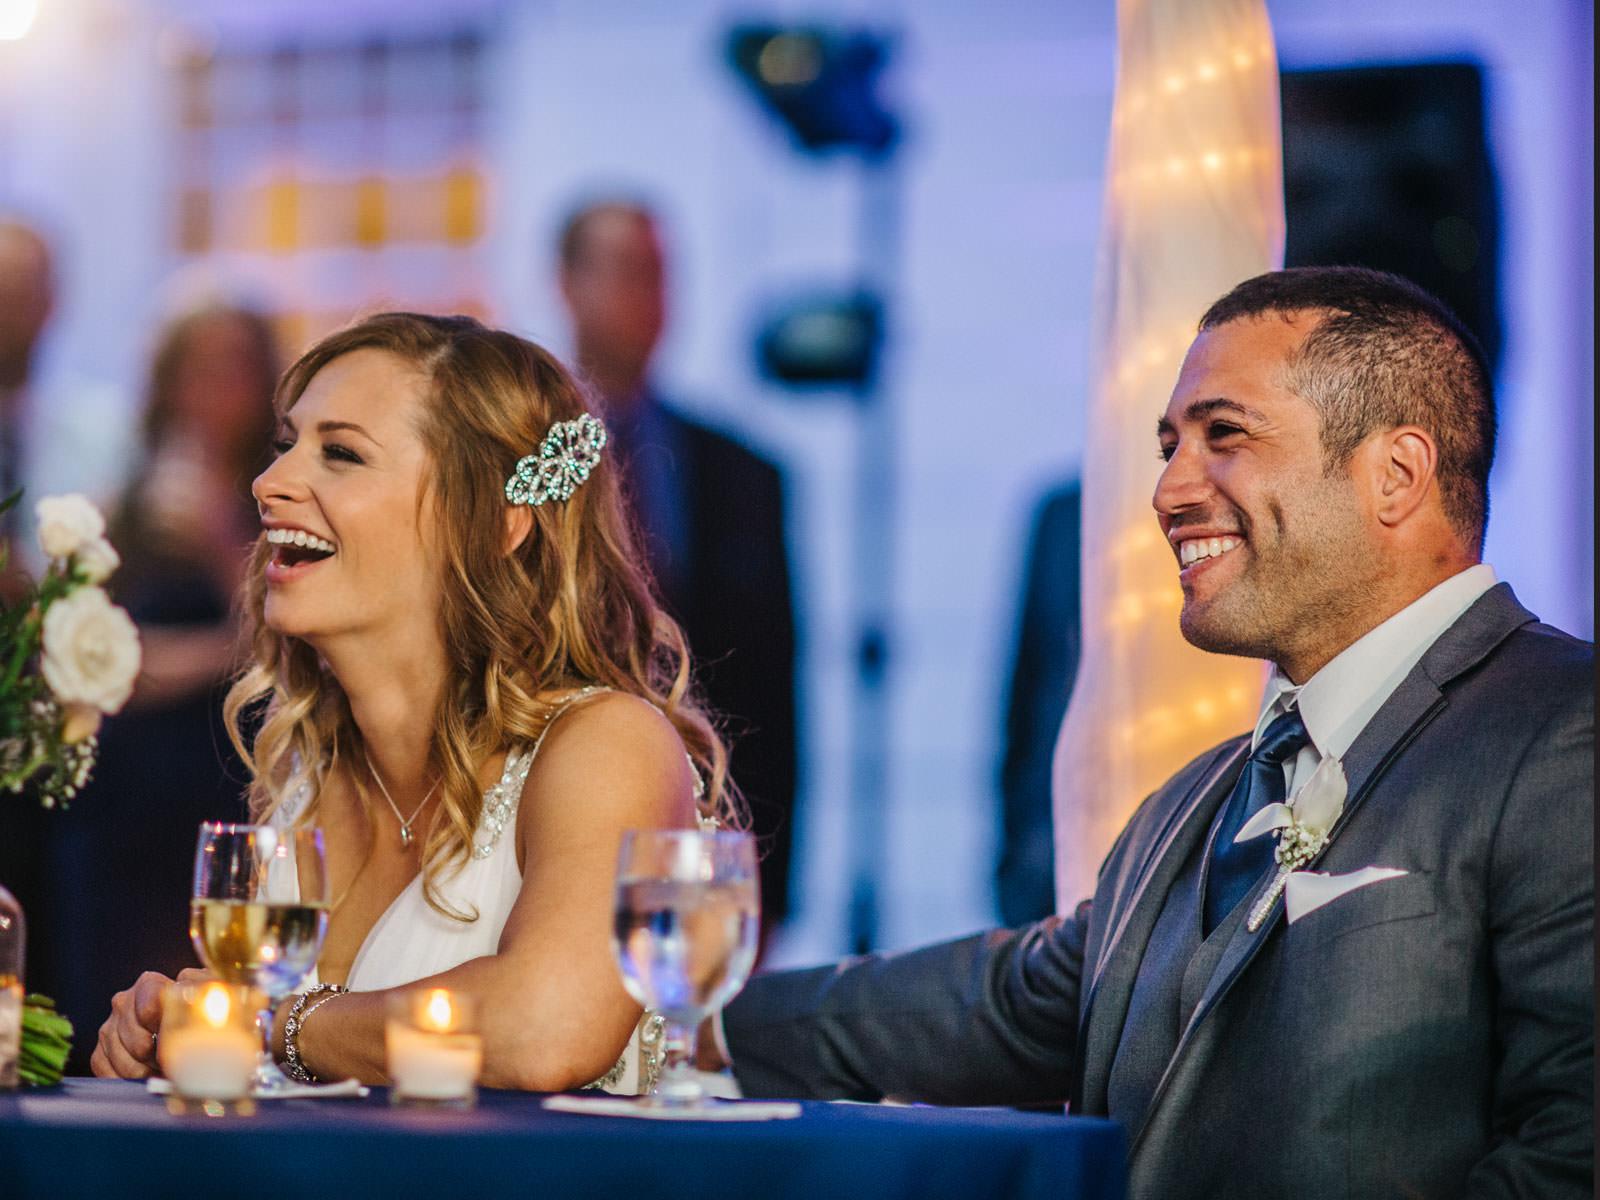 _Delaware_wedding_photographerDSC_4872.jpg